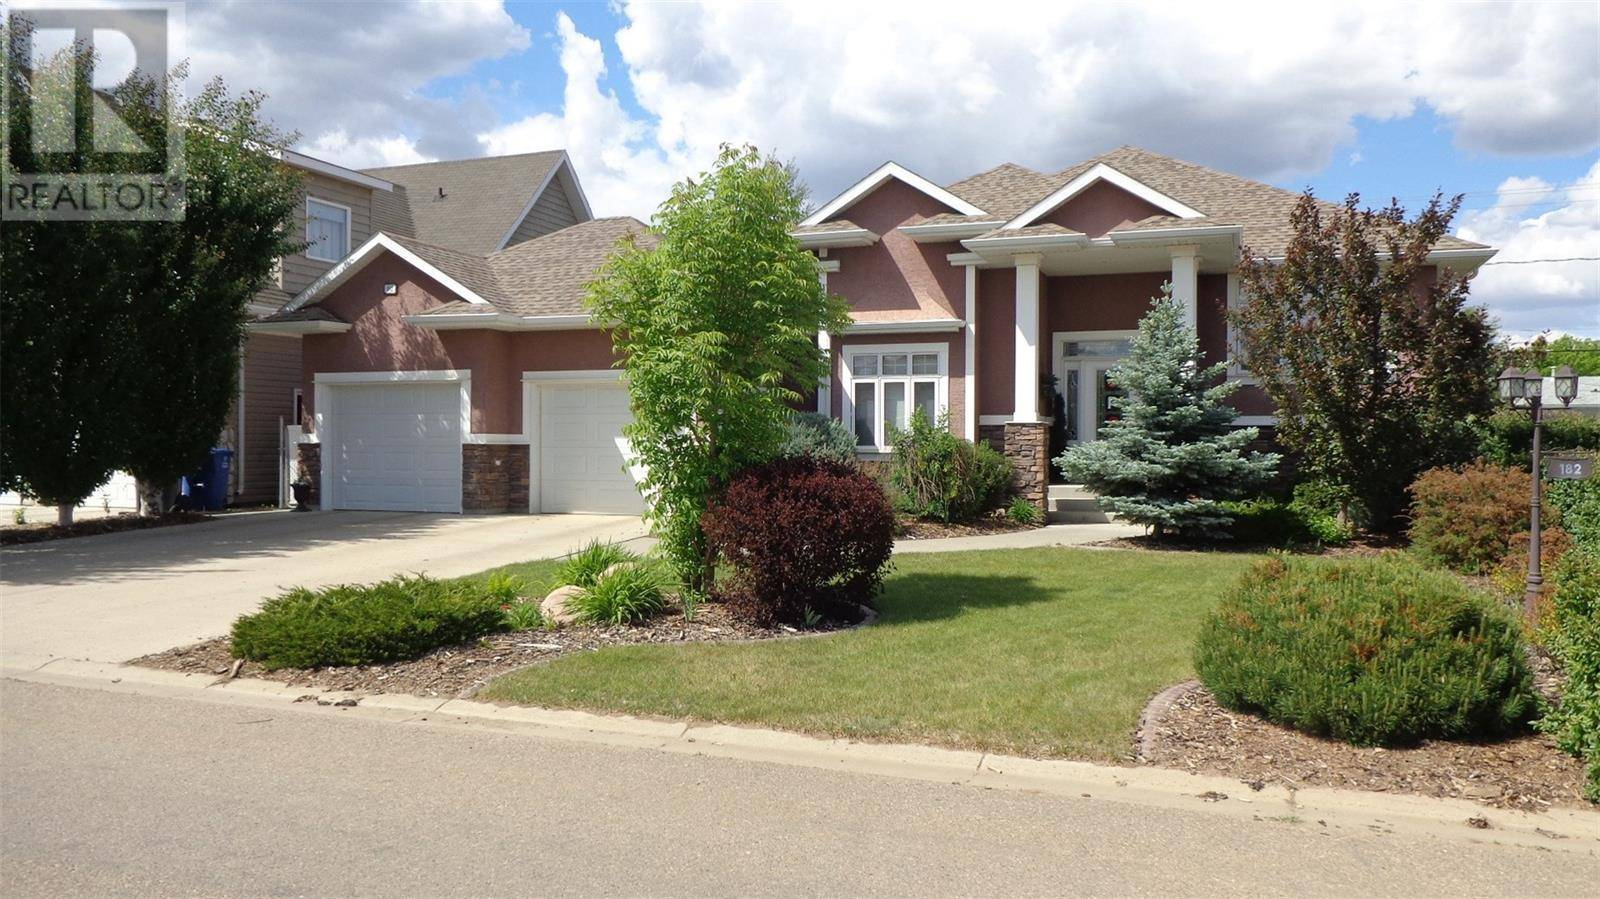 House for sale at 182 15th St Battleford Saskatchewan - MLS: SK776298